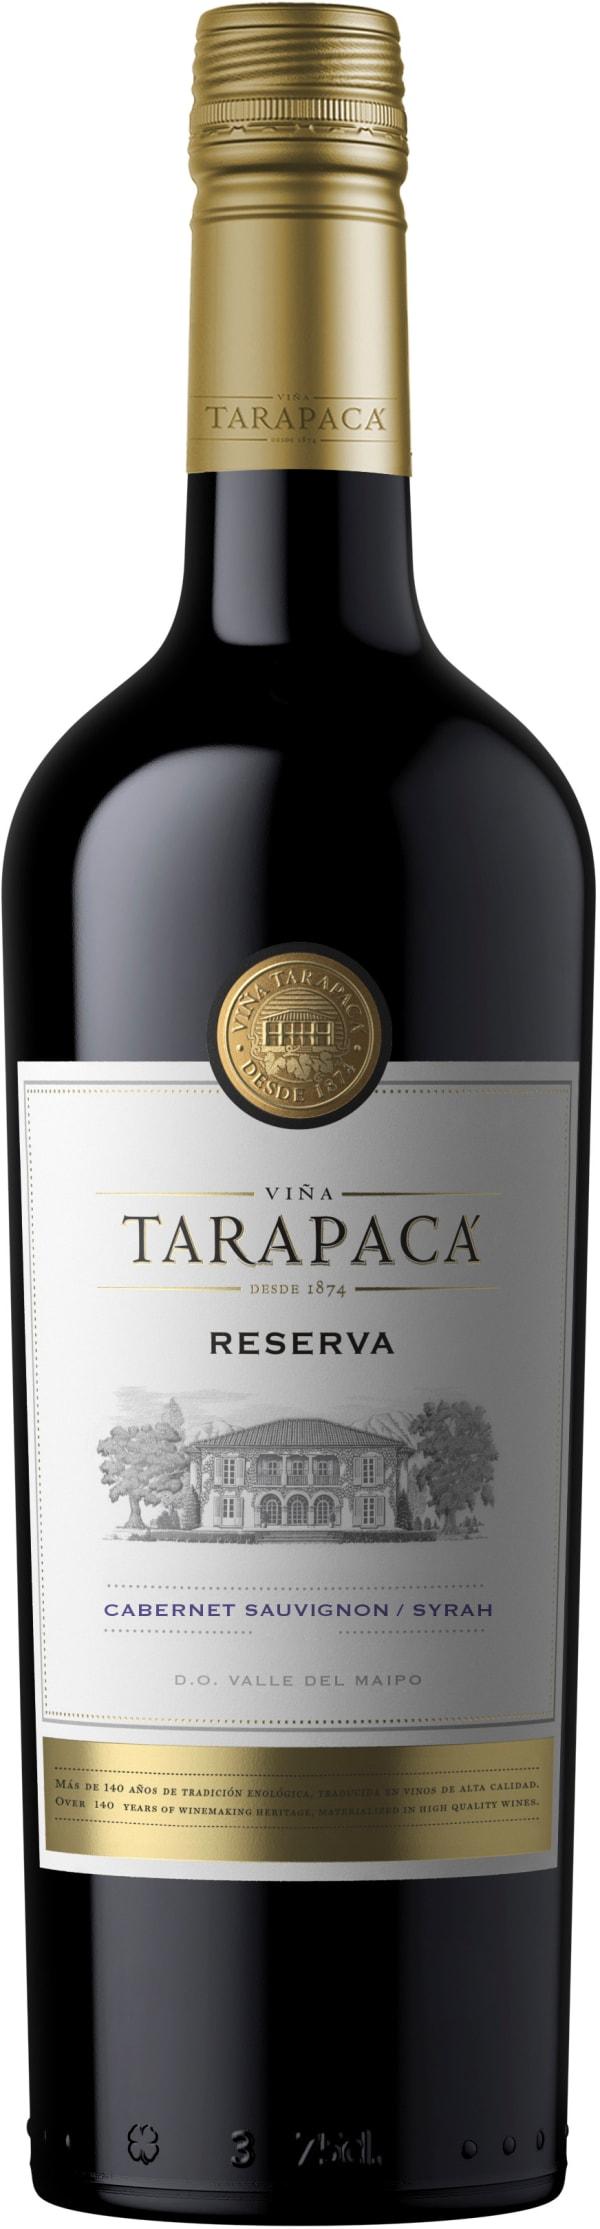 Tarapacá Reserva Cabernet Sauvignon Syrah 2020